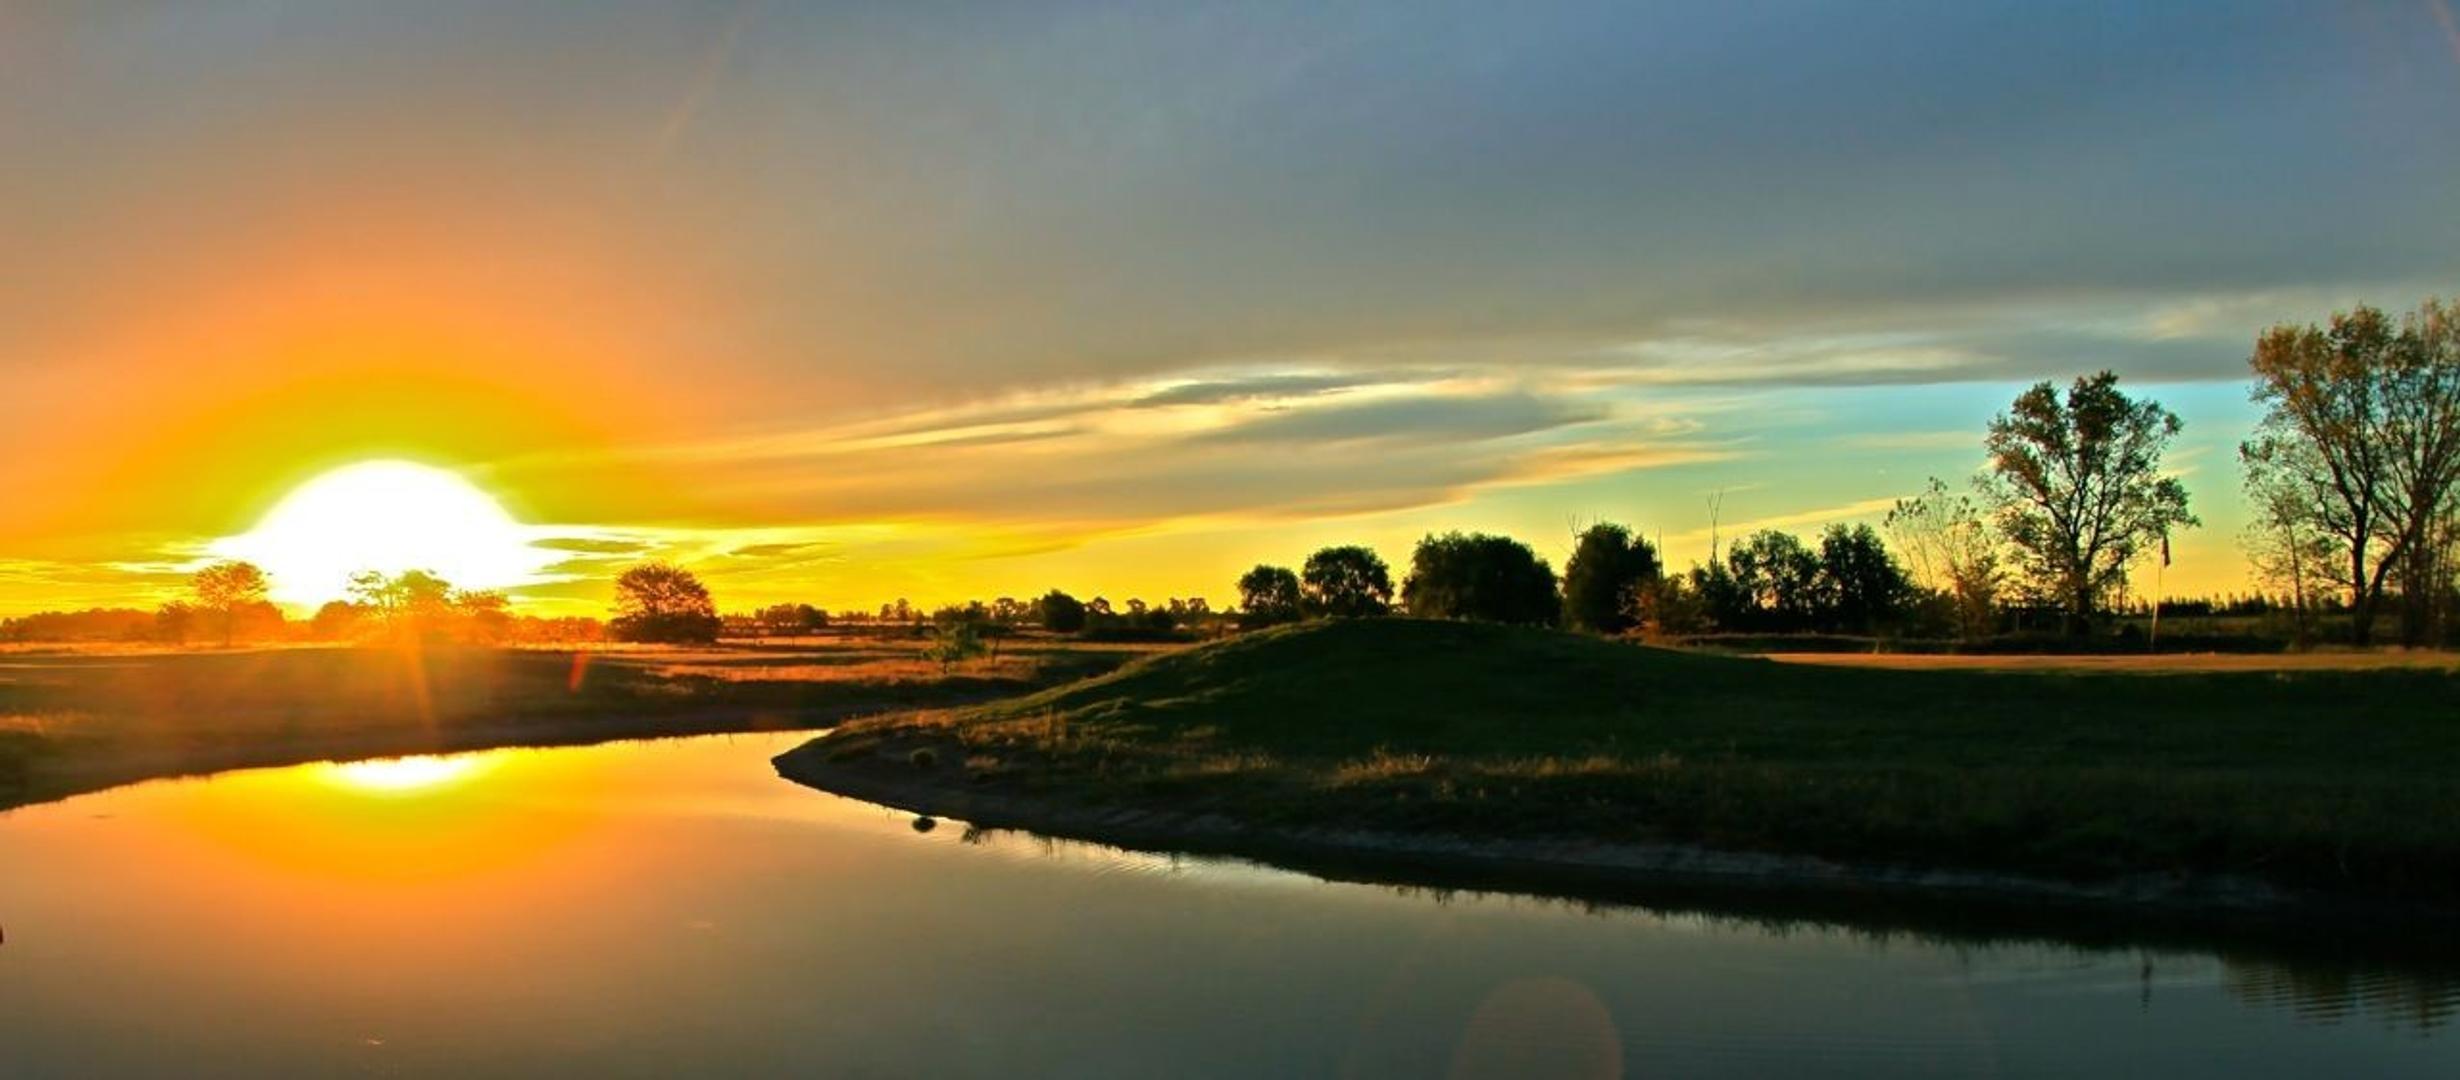 Tizado Pilar vende lotes al golf en Medal CC, Pilar y Alrededores - PIL3849_LP172635_1